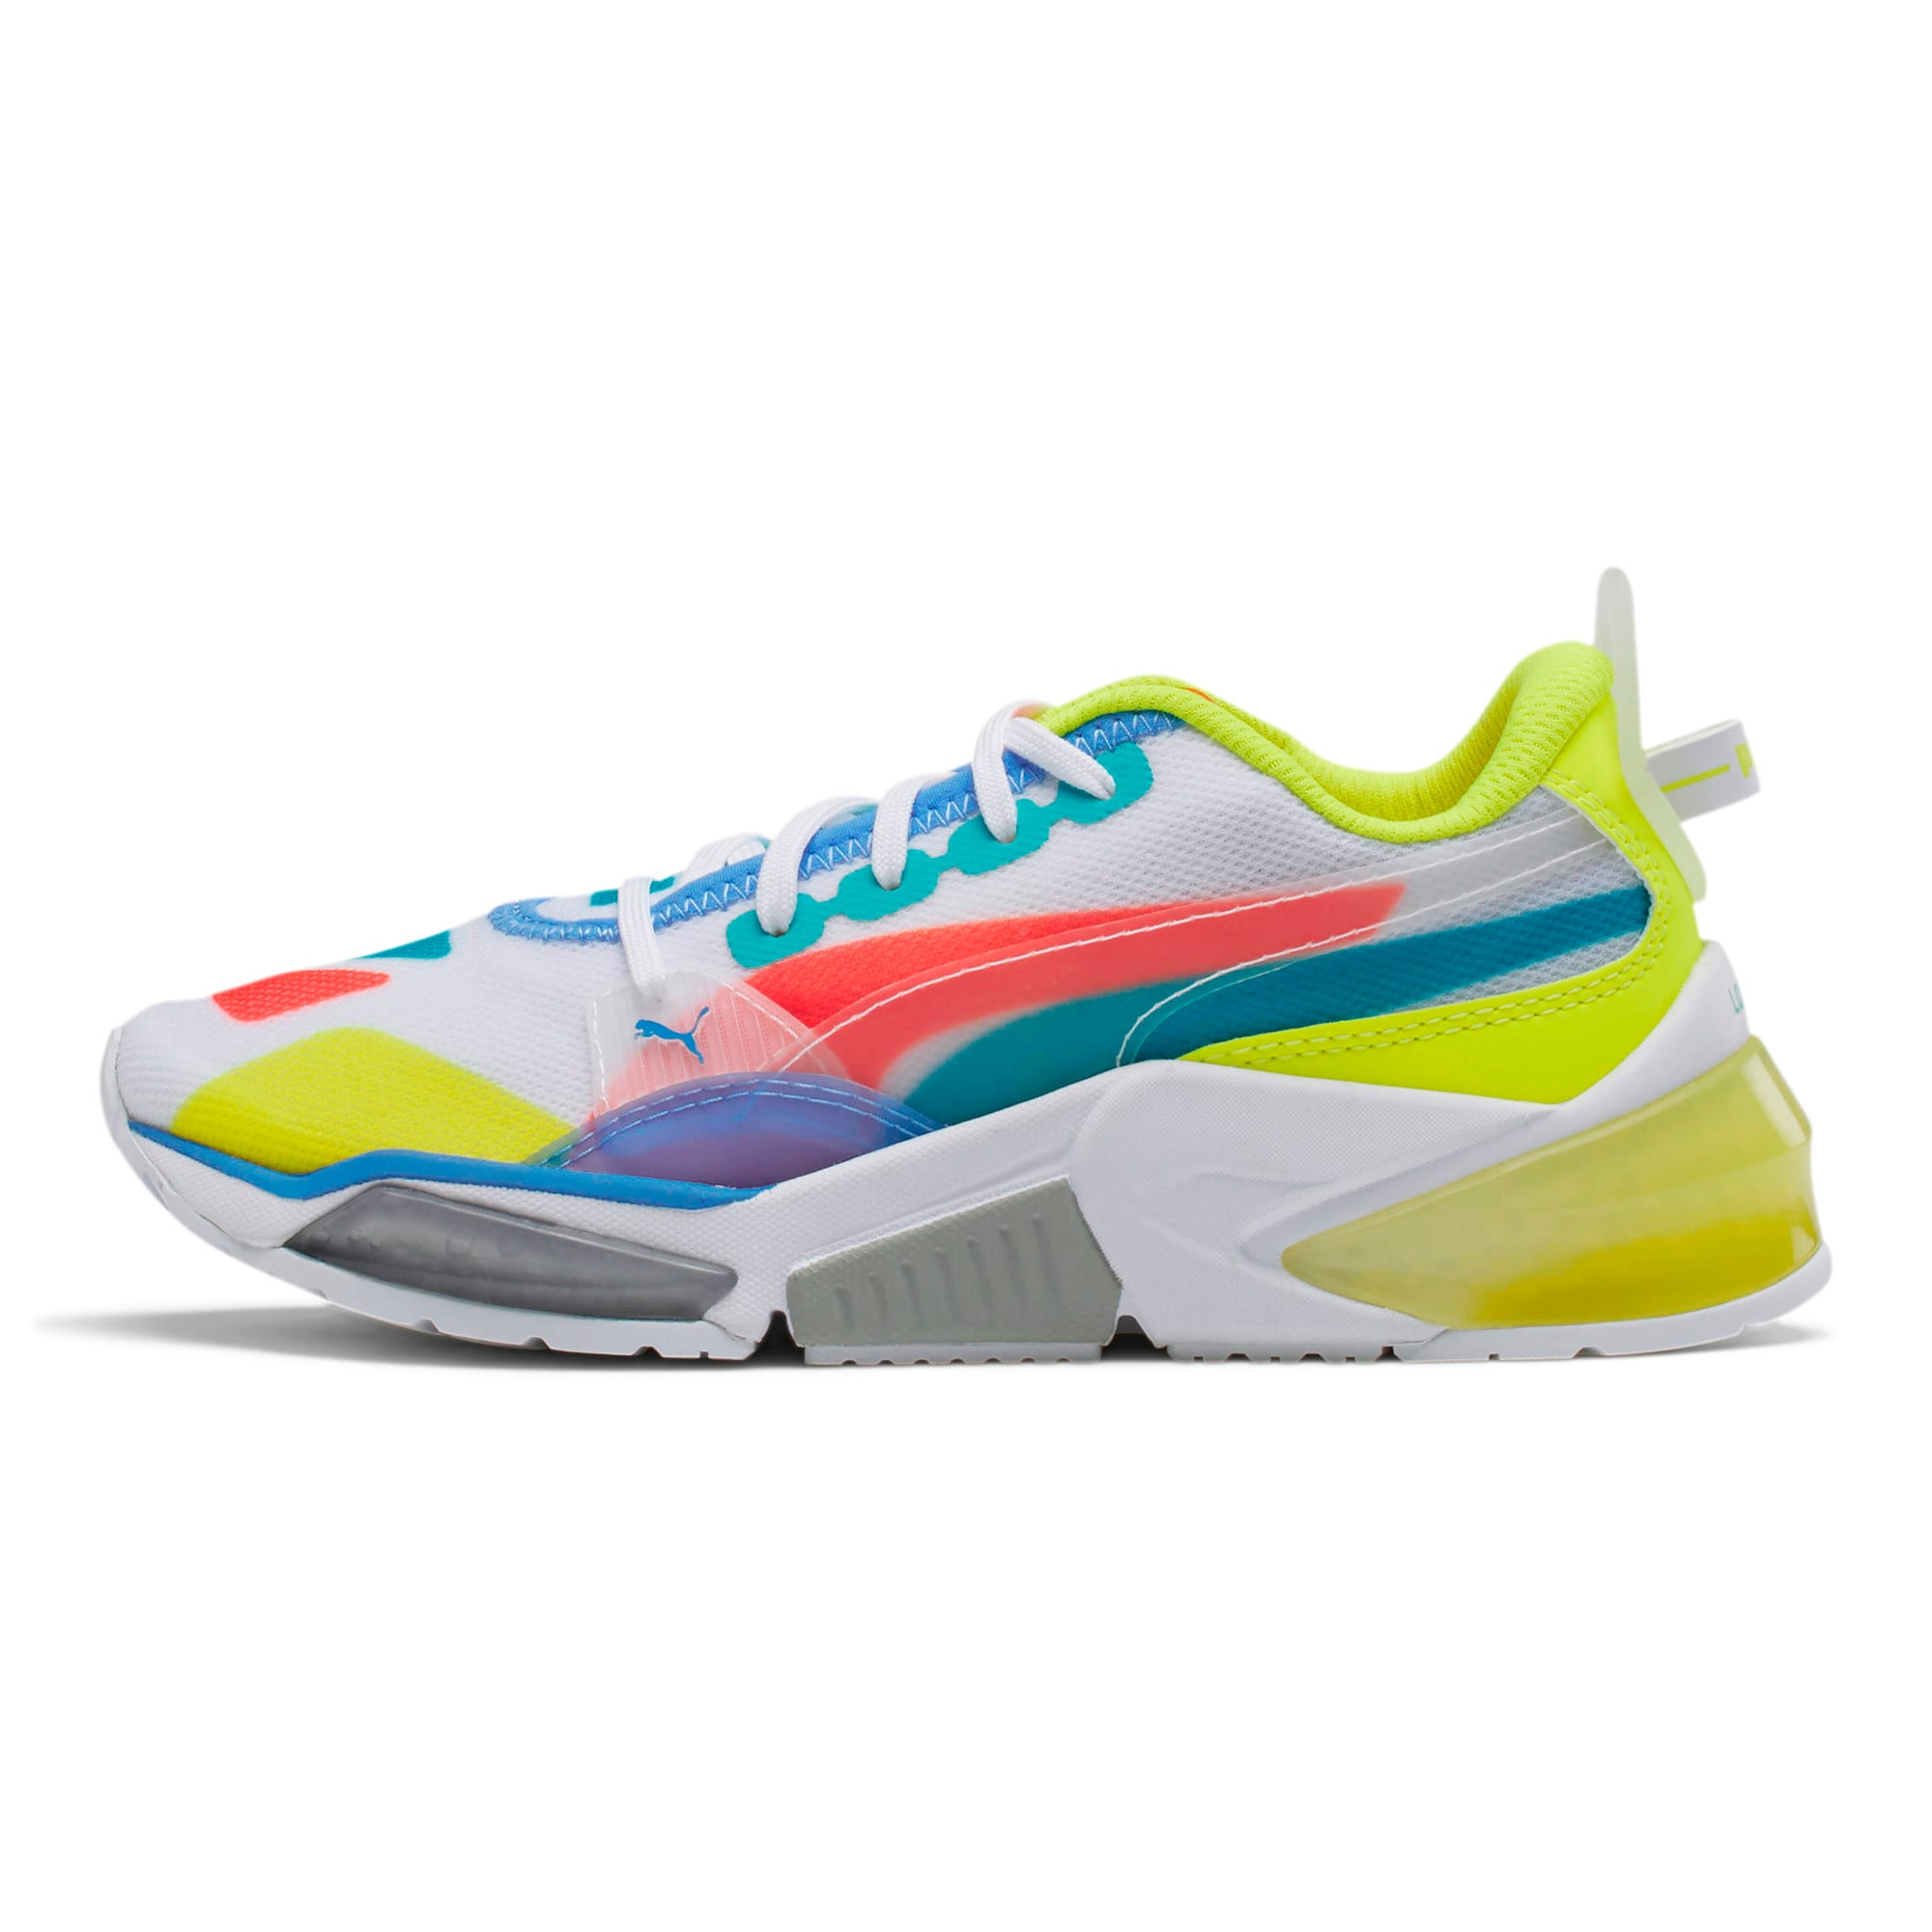 Thumbnail 1 of LQDCELL Optic Sheer Training Shoes JR, White-Nrgy Rose-Yellow, medium